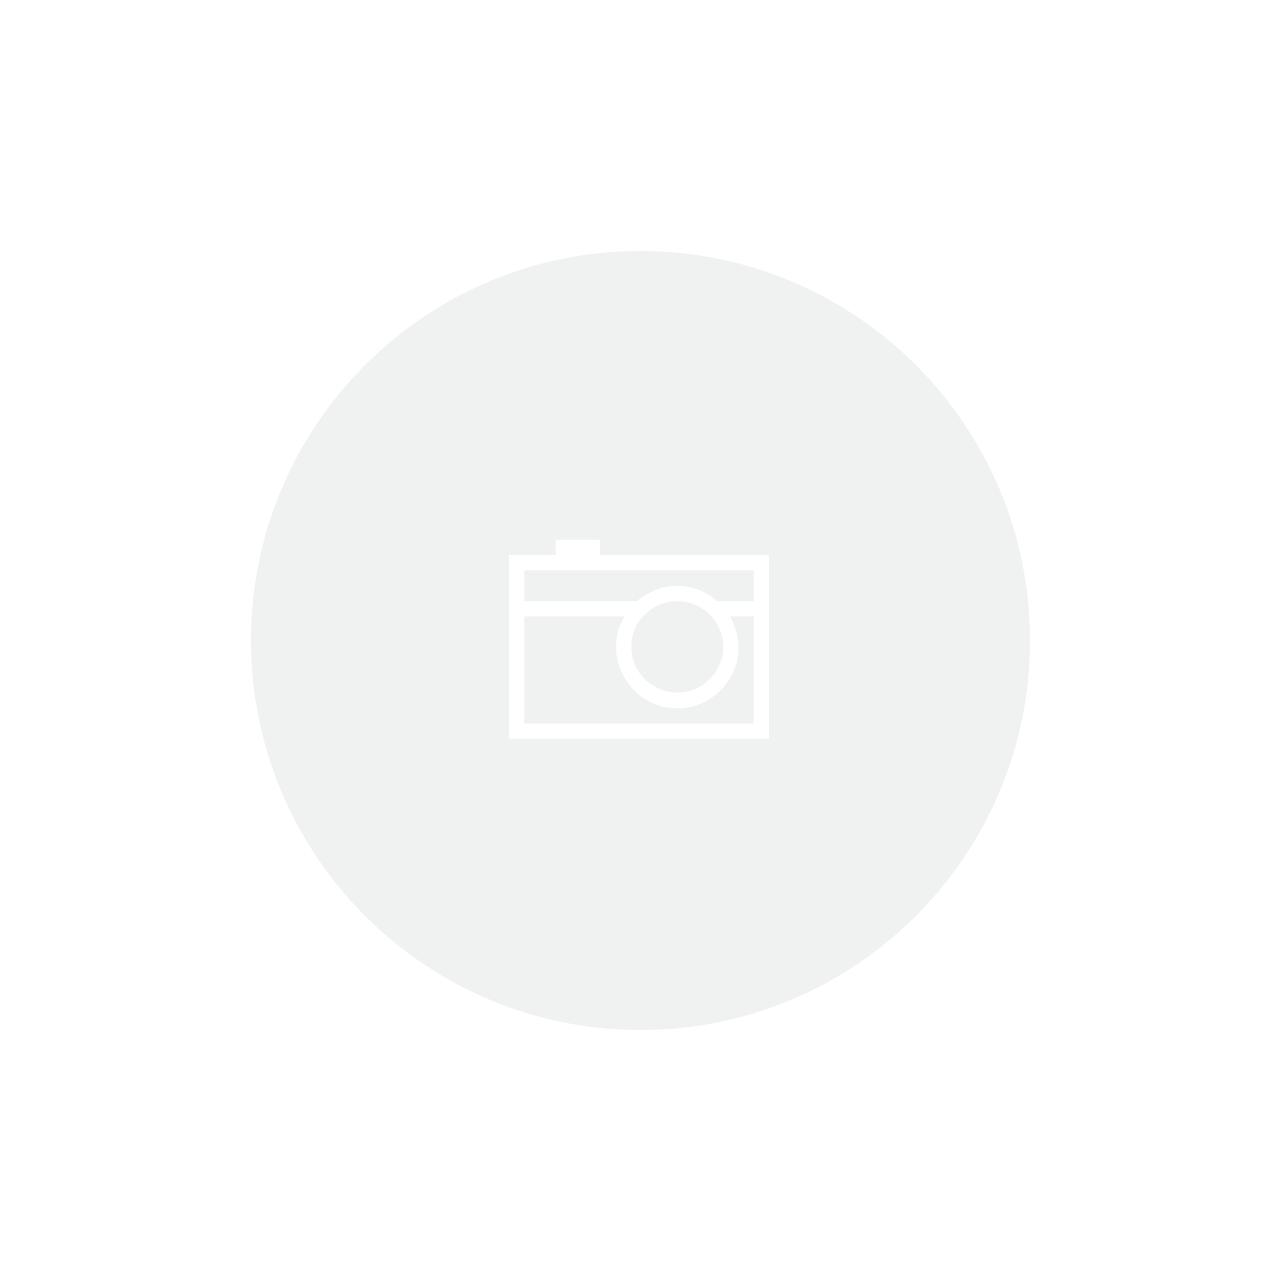 Papel Artesanal Indiano - Ref. 80